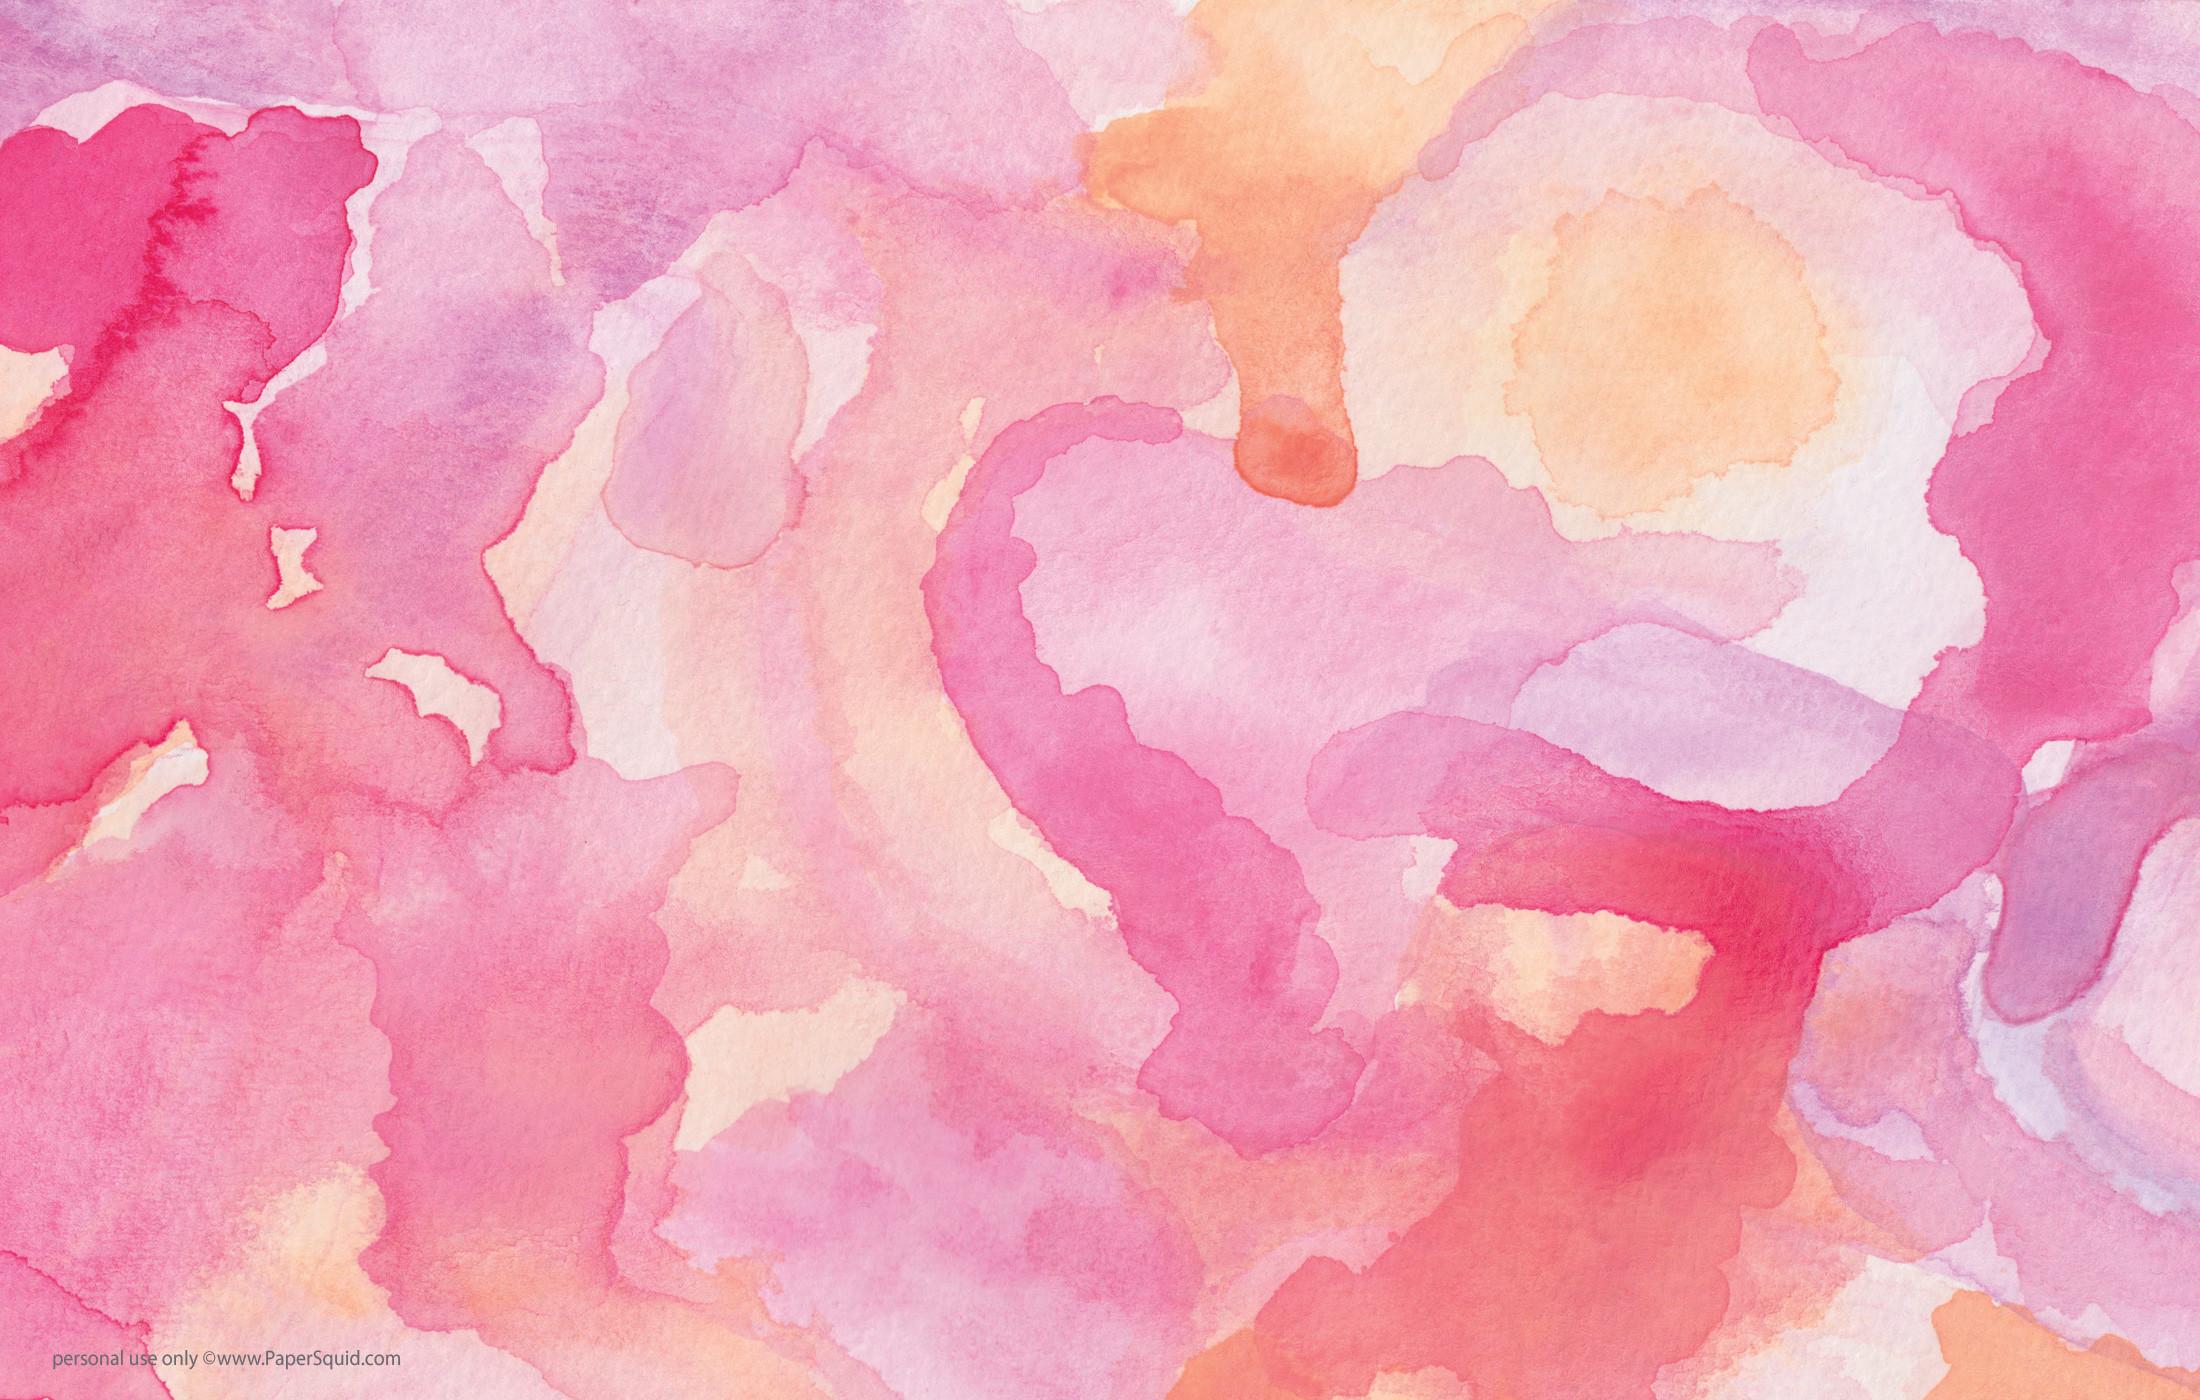 Free Widescreen Fall Wallpaper Watercolor Wallpapers 183 ①